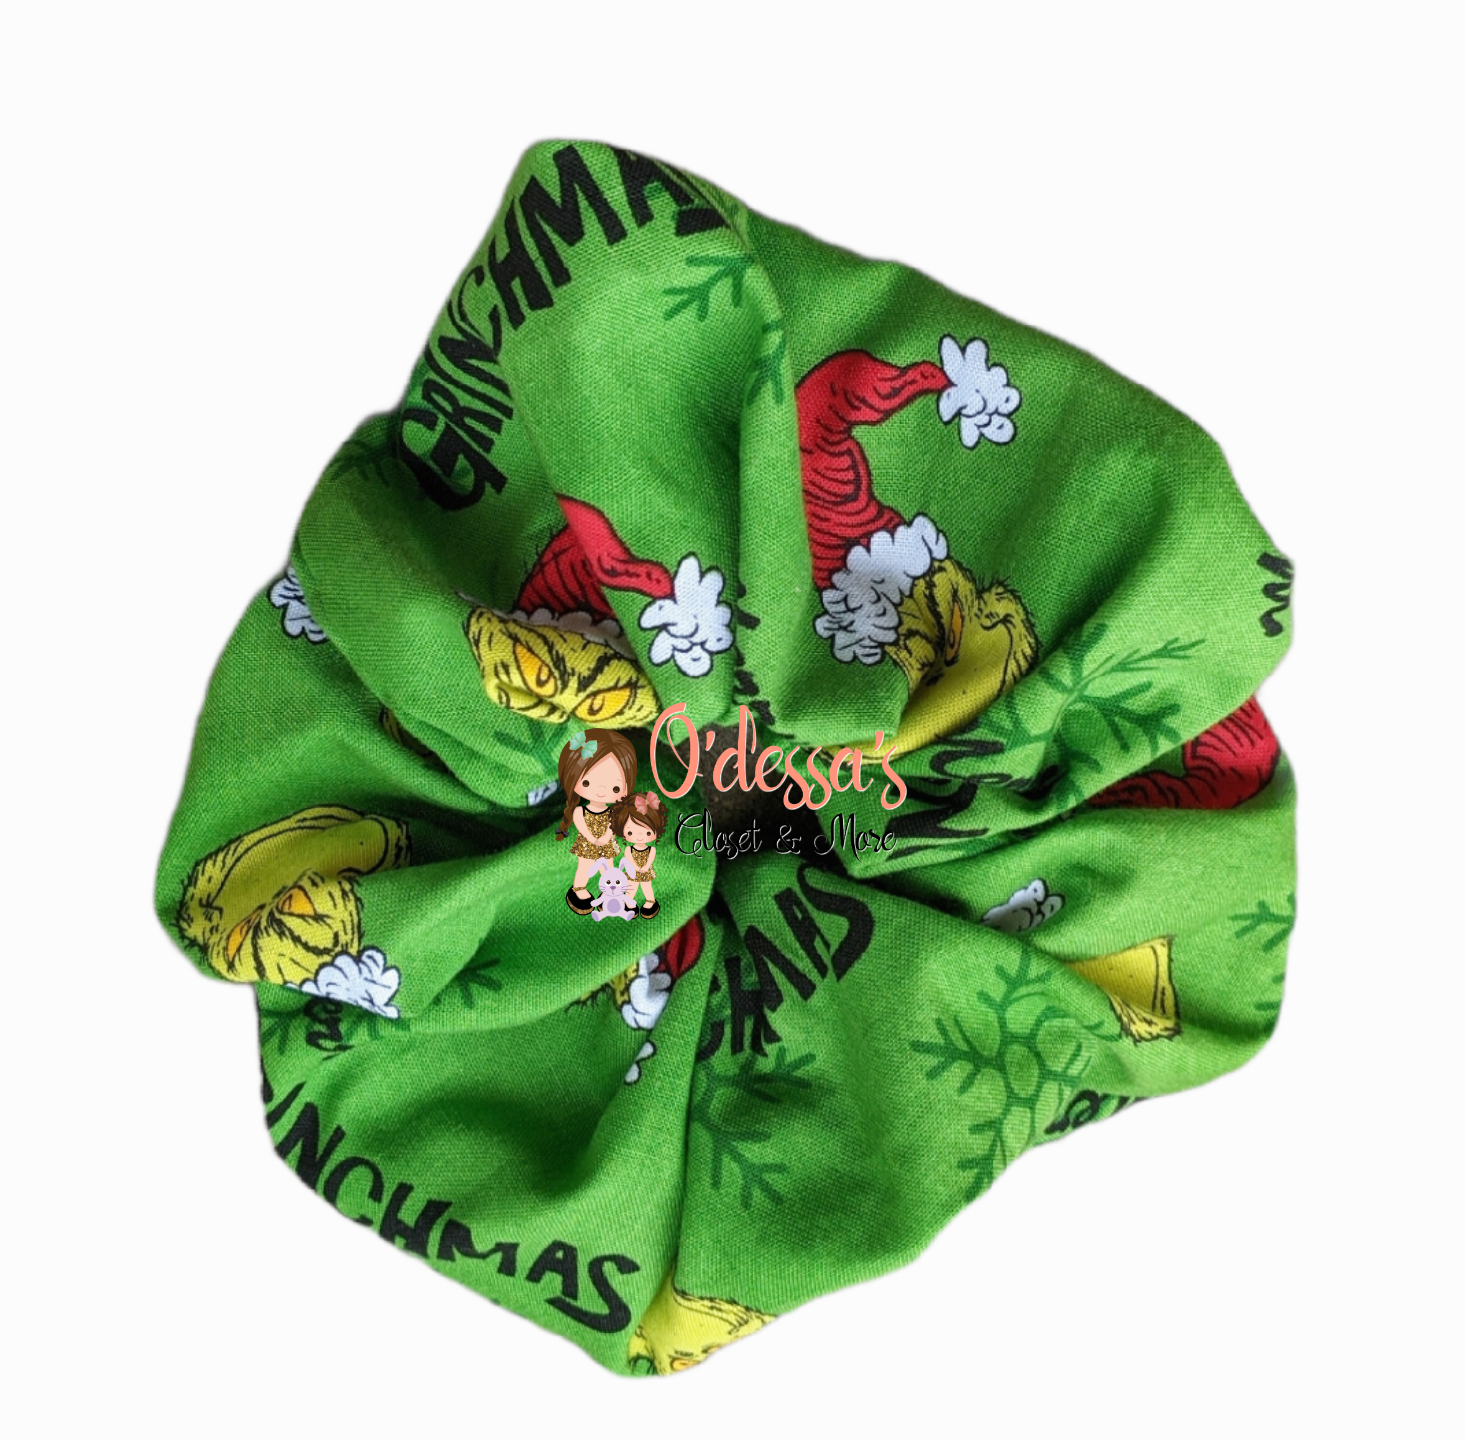 Christmas Scrunchies- Green Monster Whoville Scrunchies - G. Monster Toss